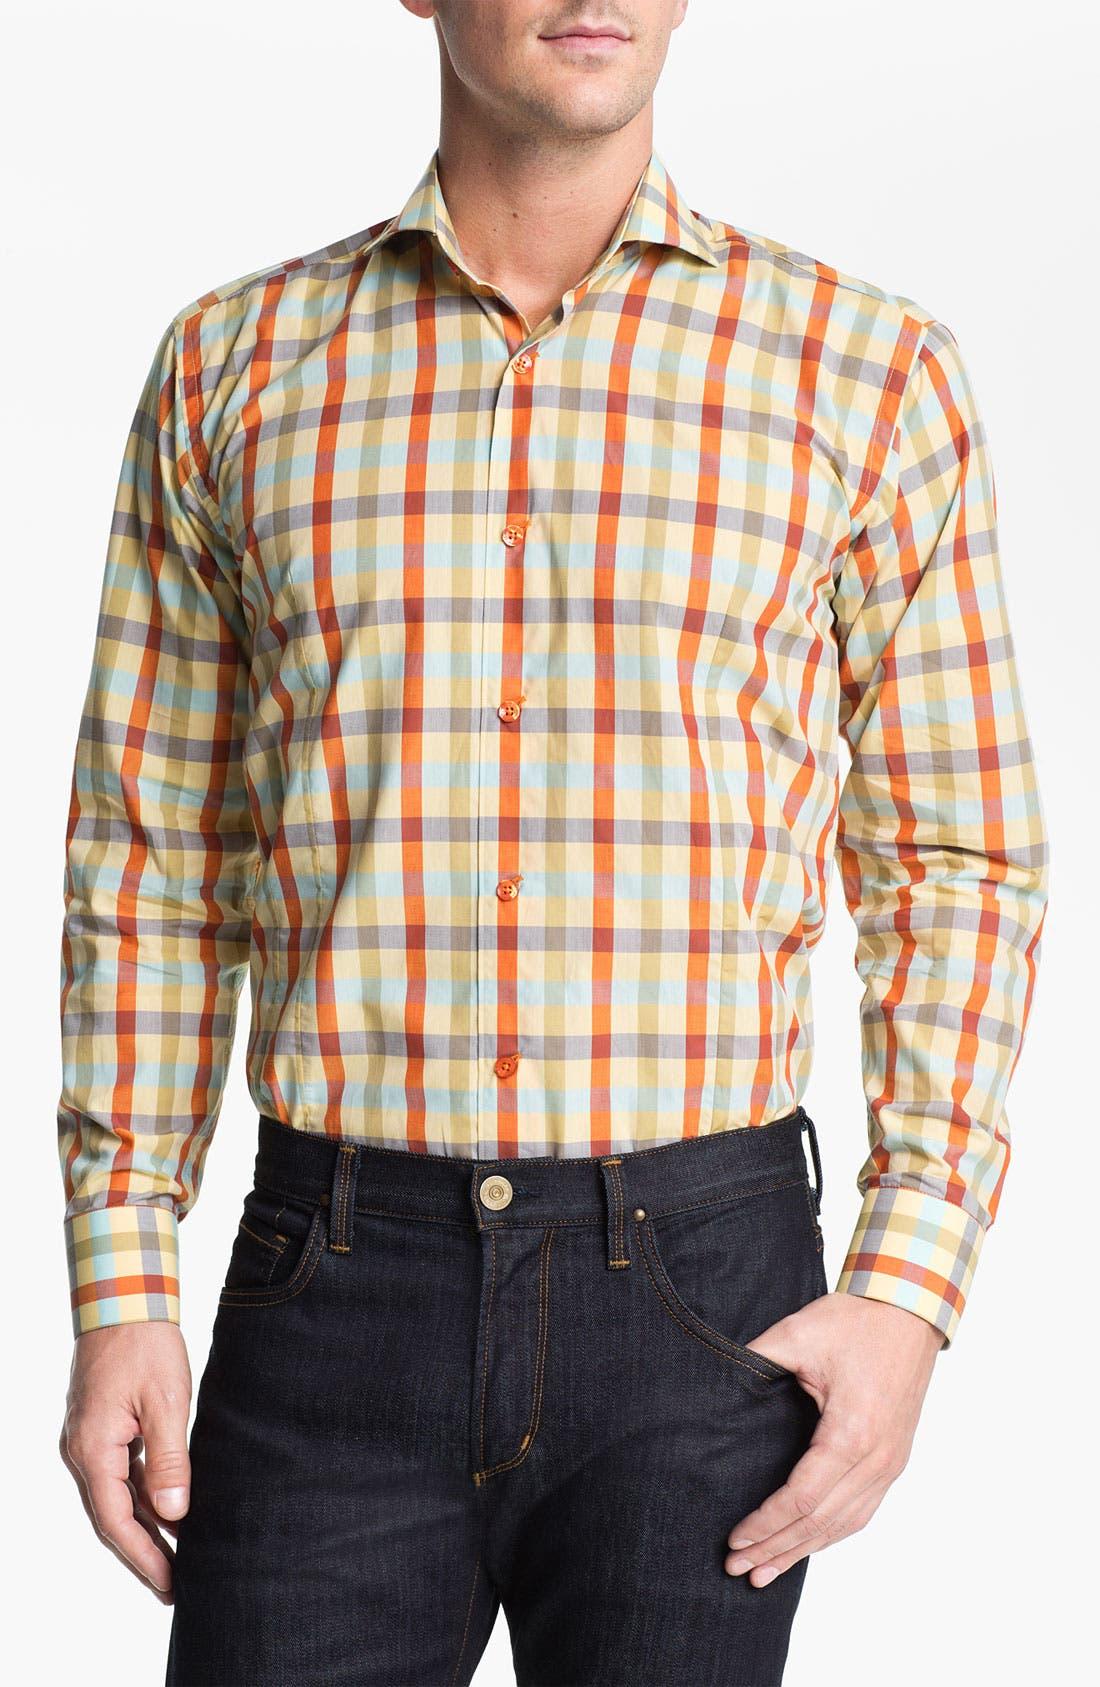 Alternate Image 1 Selected - Bogosse 'Chain 51' Trim Fit Sport Shirt